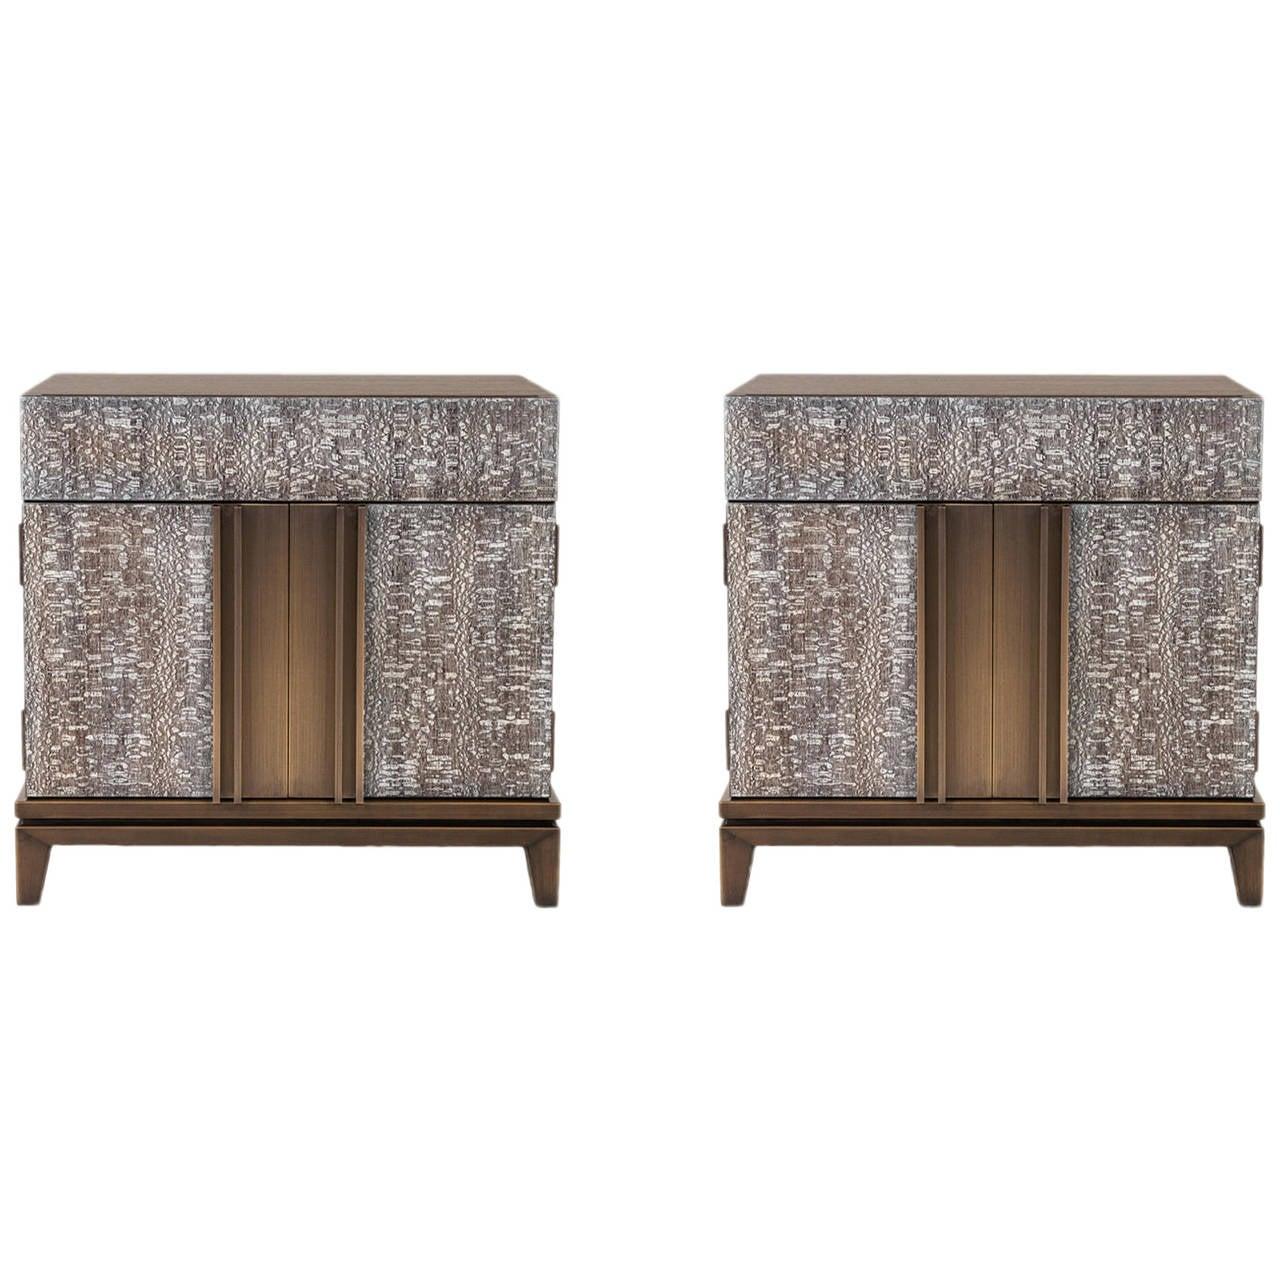 mid century modern bedroom furniture 1 387 for sale at 1stdibs